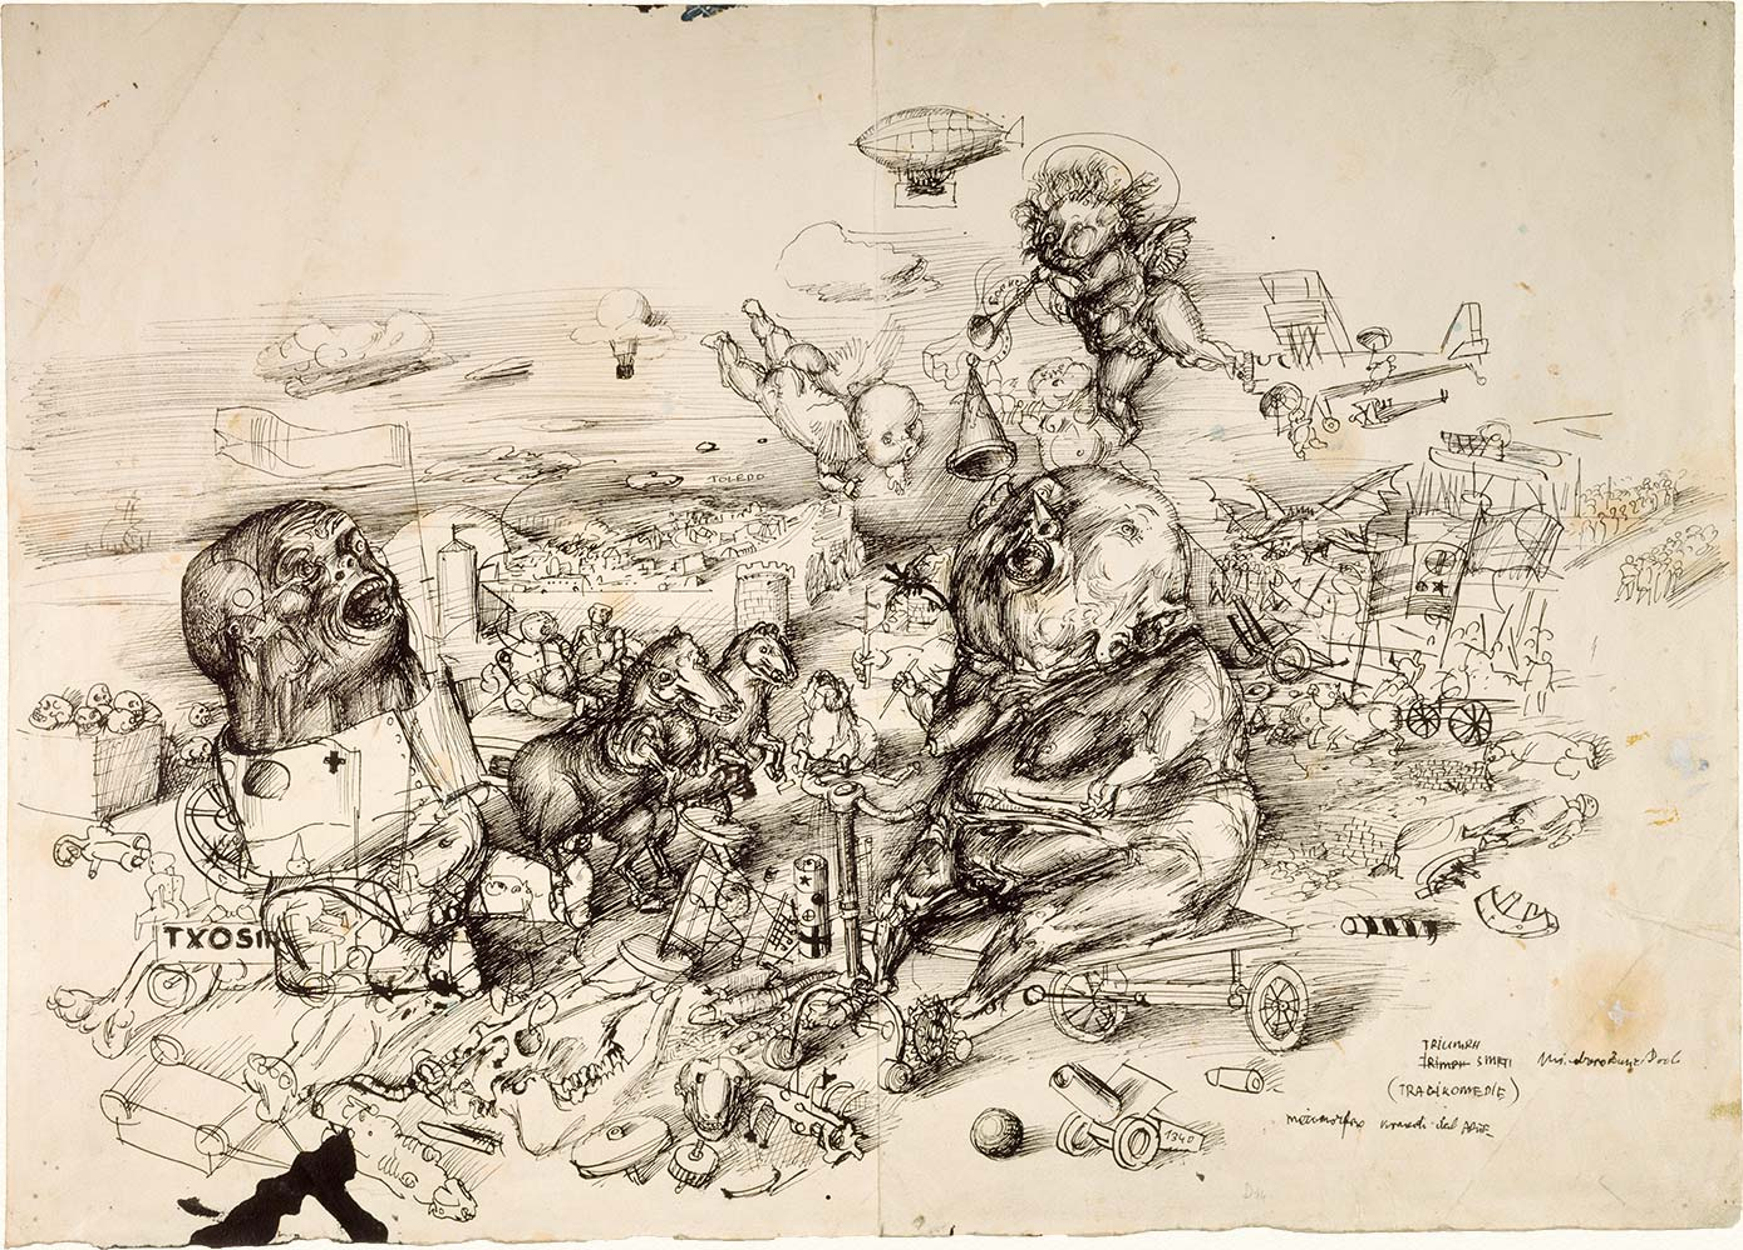 Metamorphosis, Commedia dell'Arte